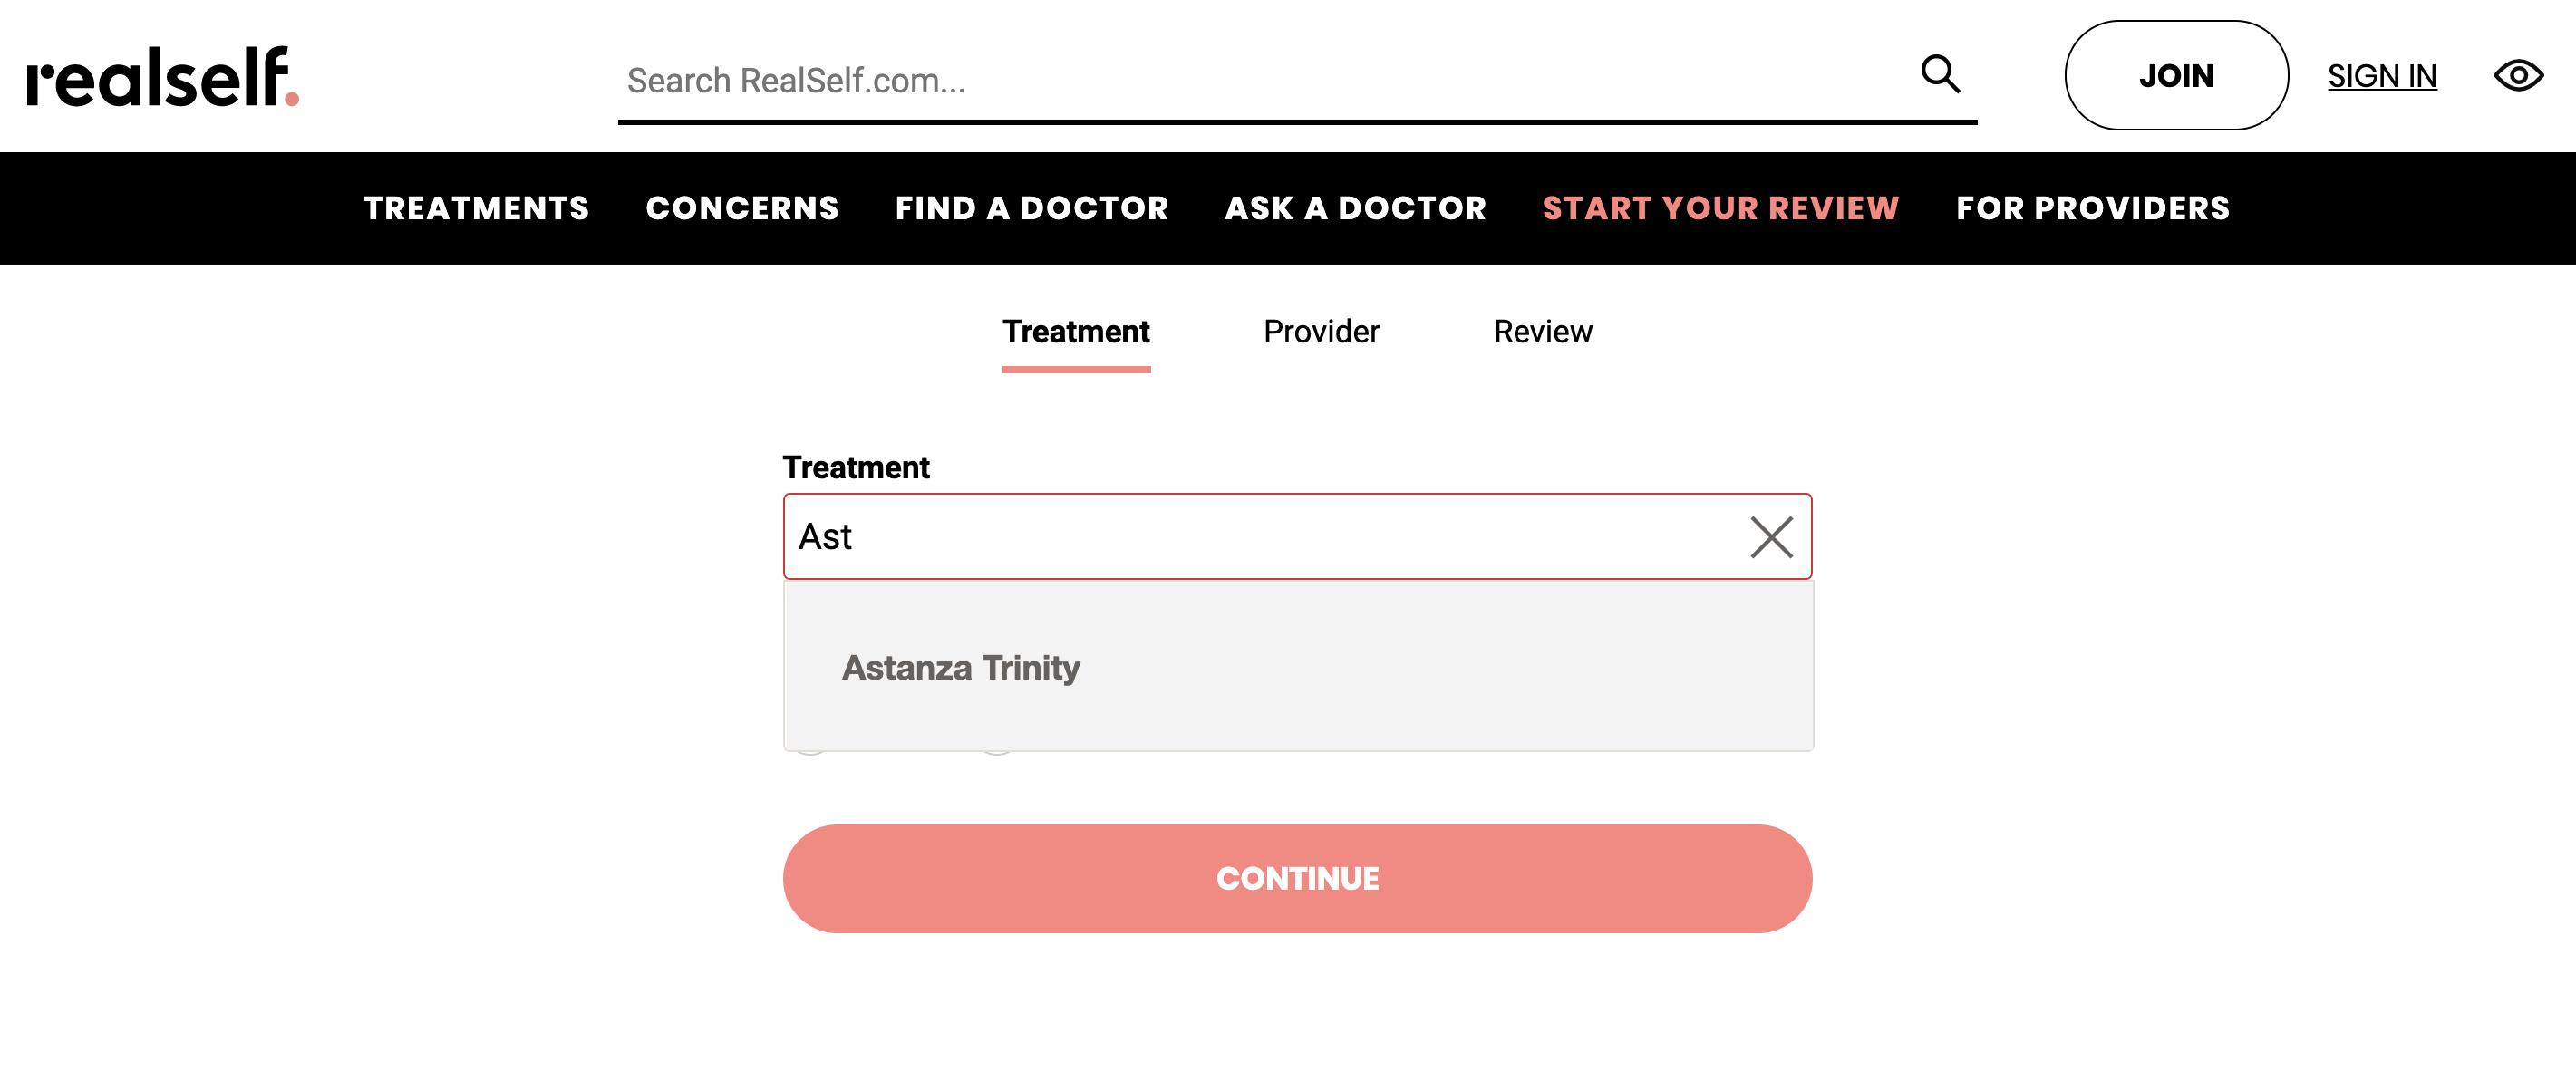 Astanza Trinity Treatment Page RealSelf